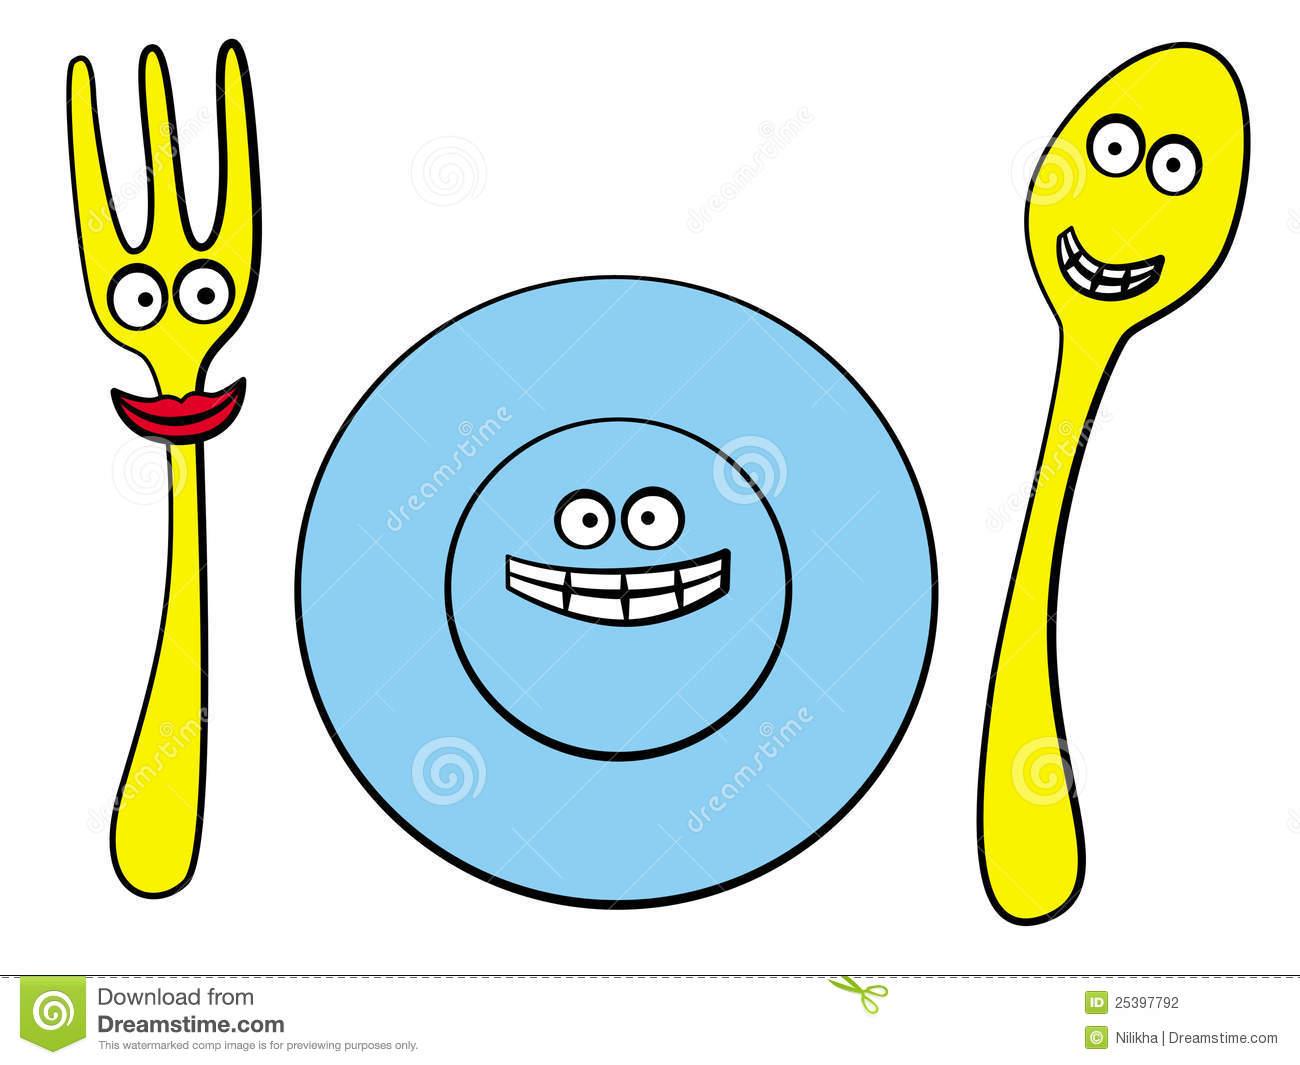 Eating utensil clipart - Clipground